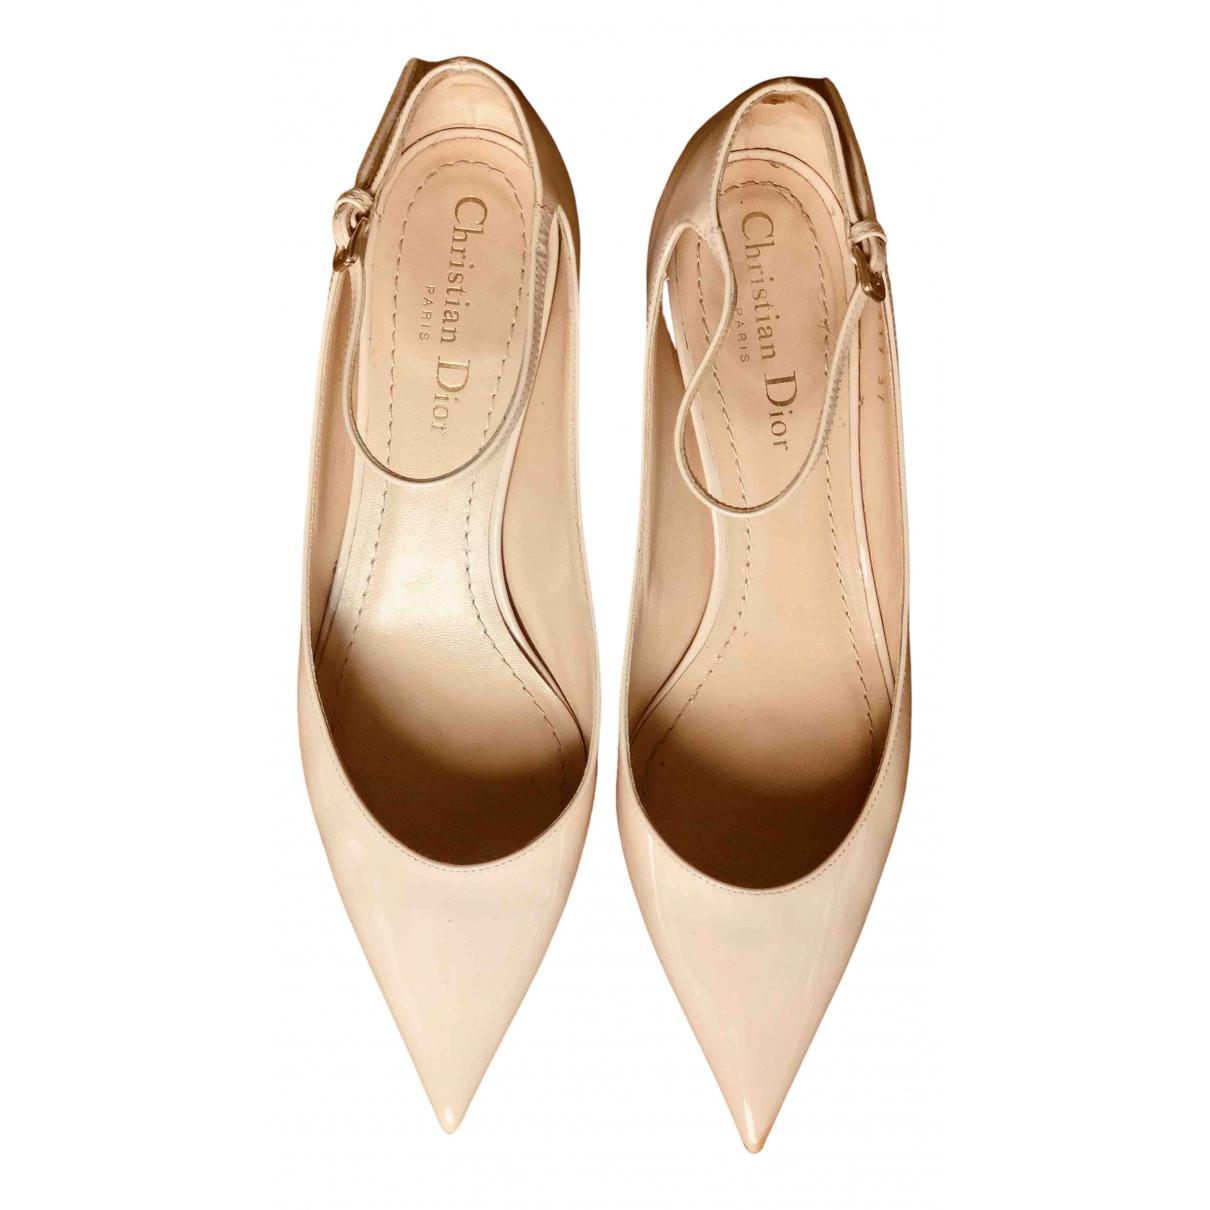 Dior N Beige Patent leather Heels for Women 37 EU